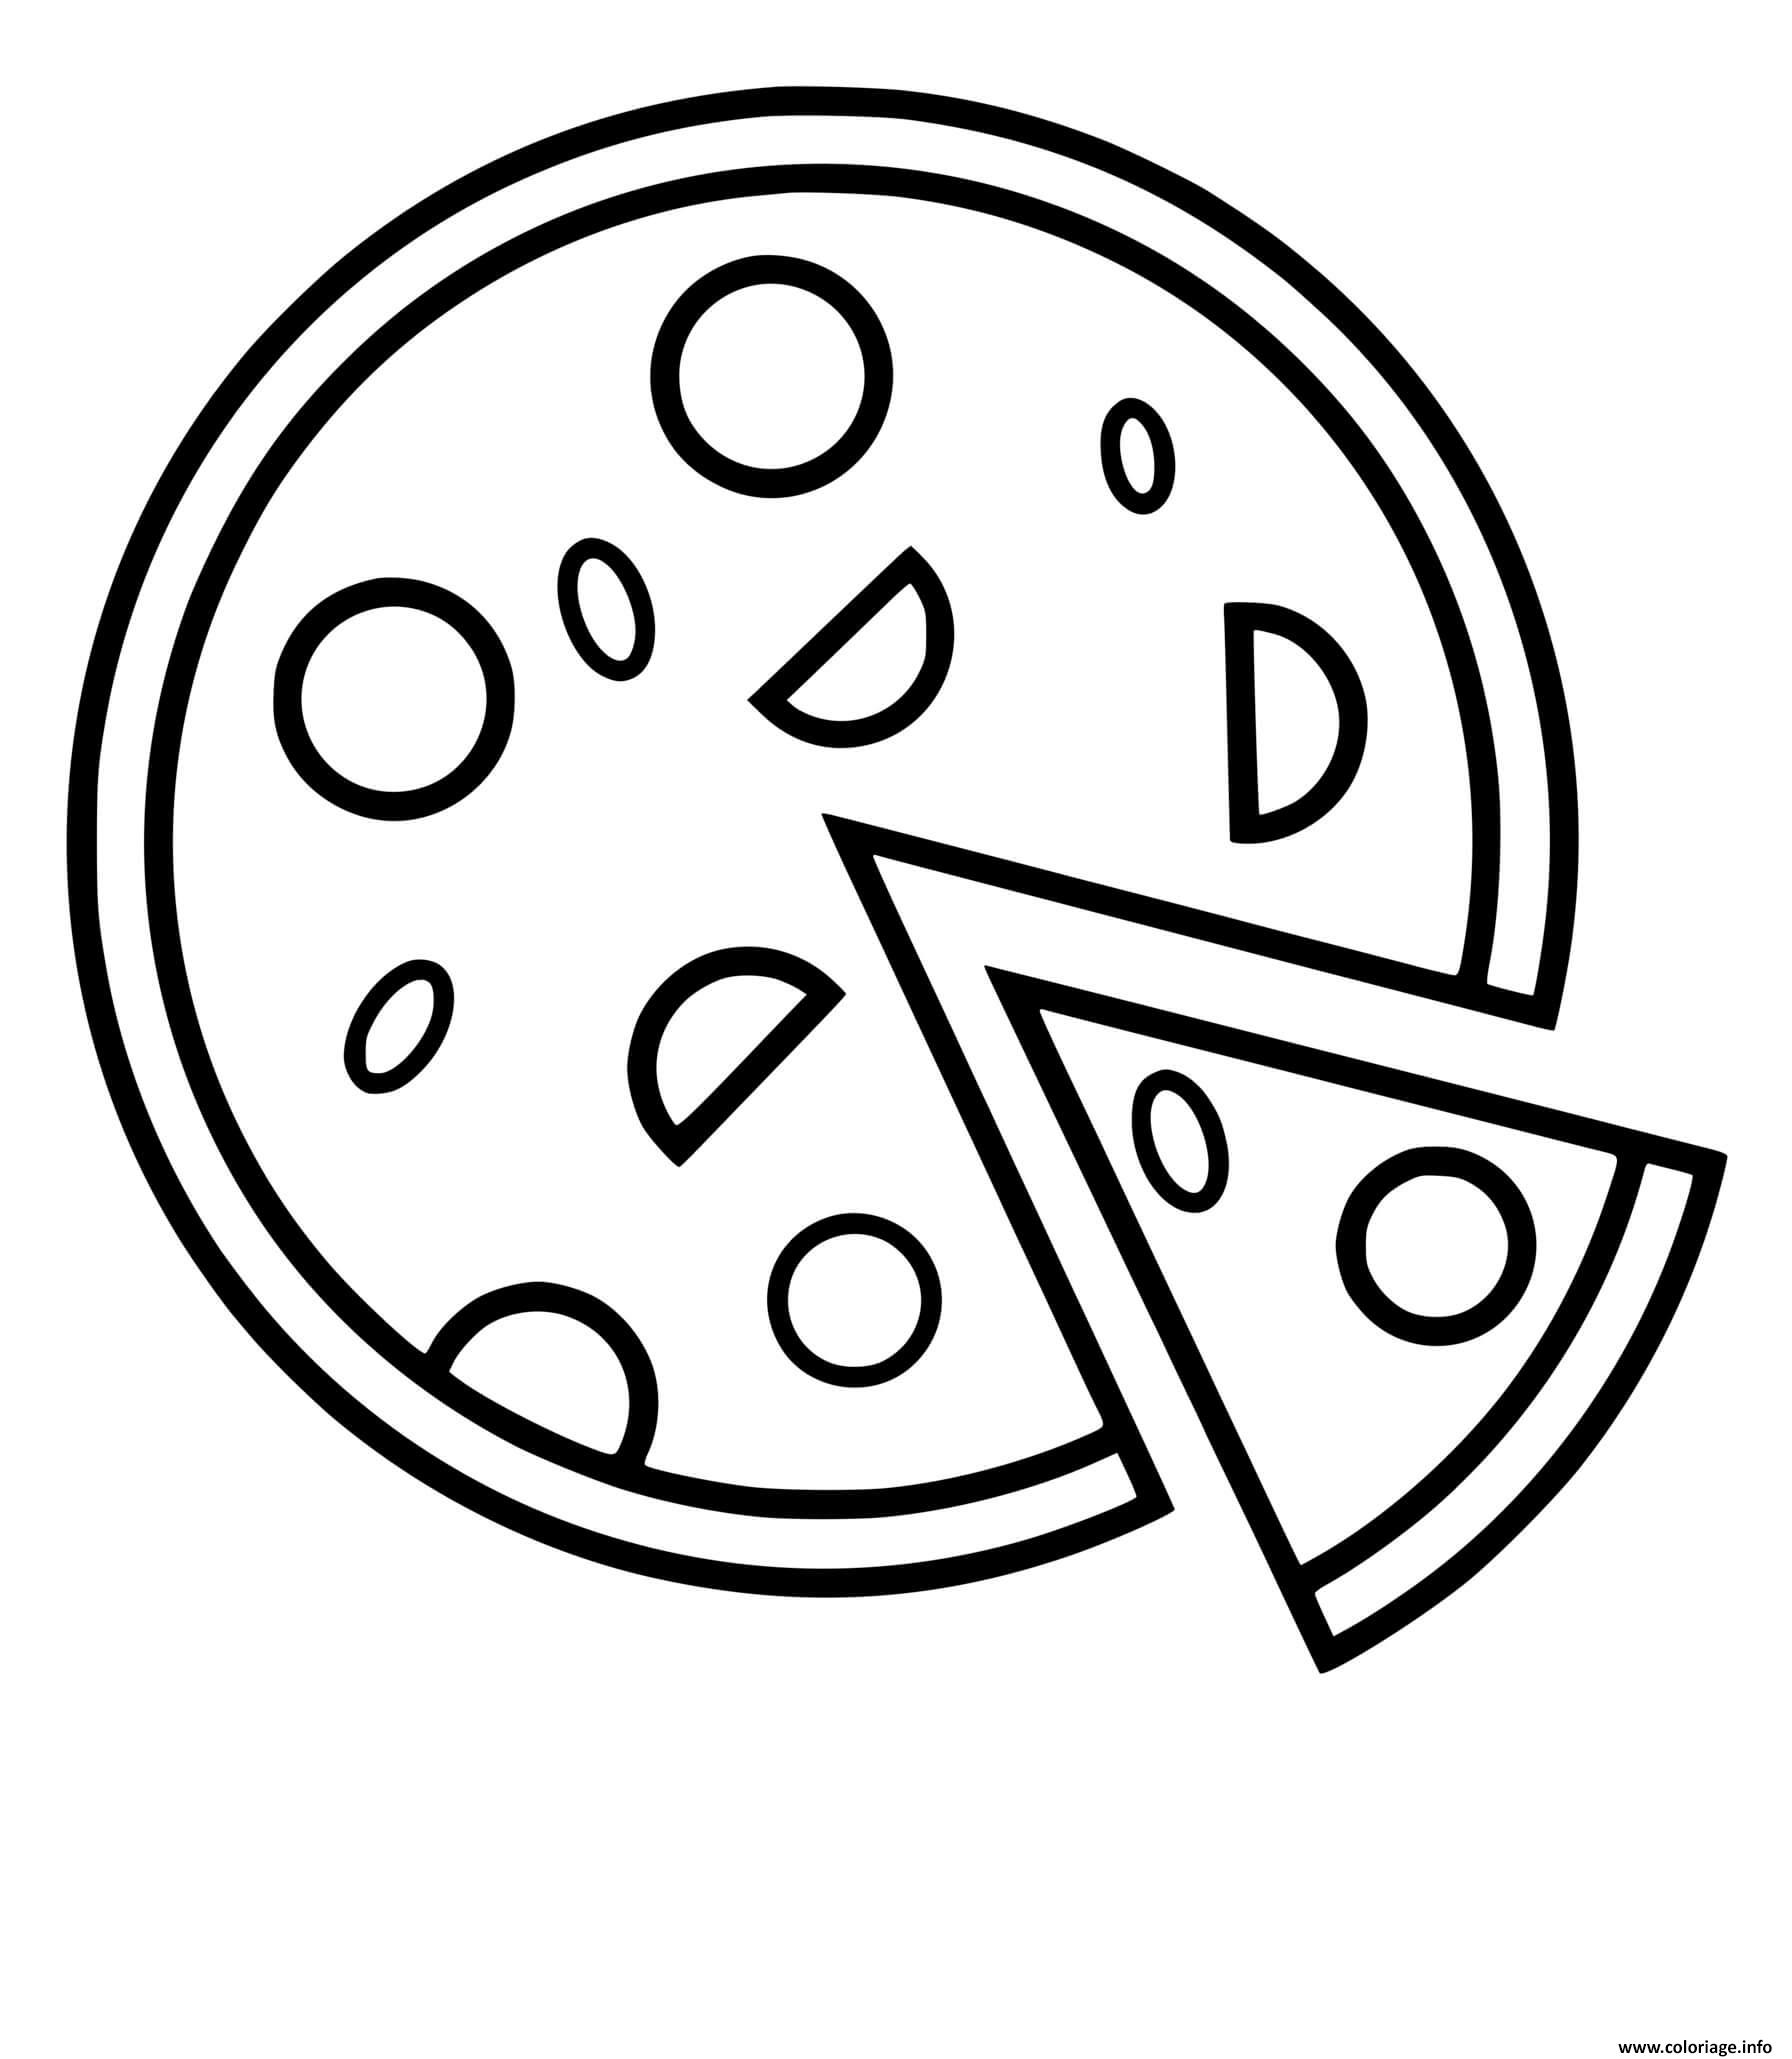 Dessin pizza simple sauce tomate mozzarella Coloriage Gratuit à Imprimer